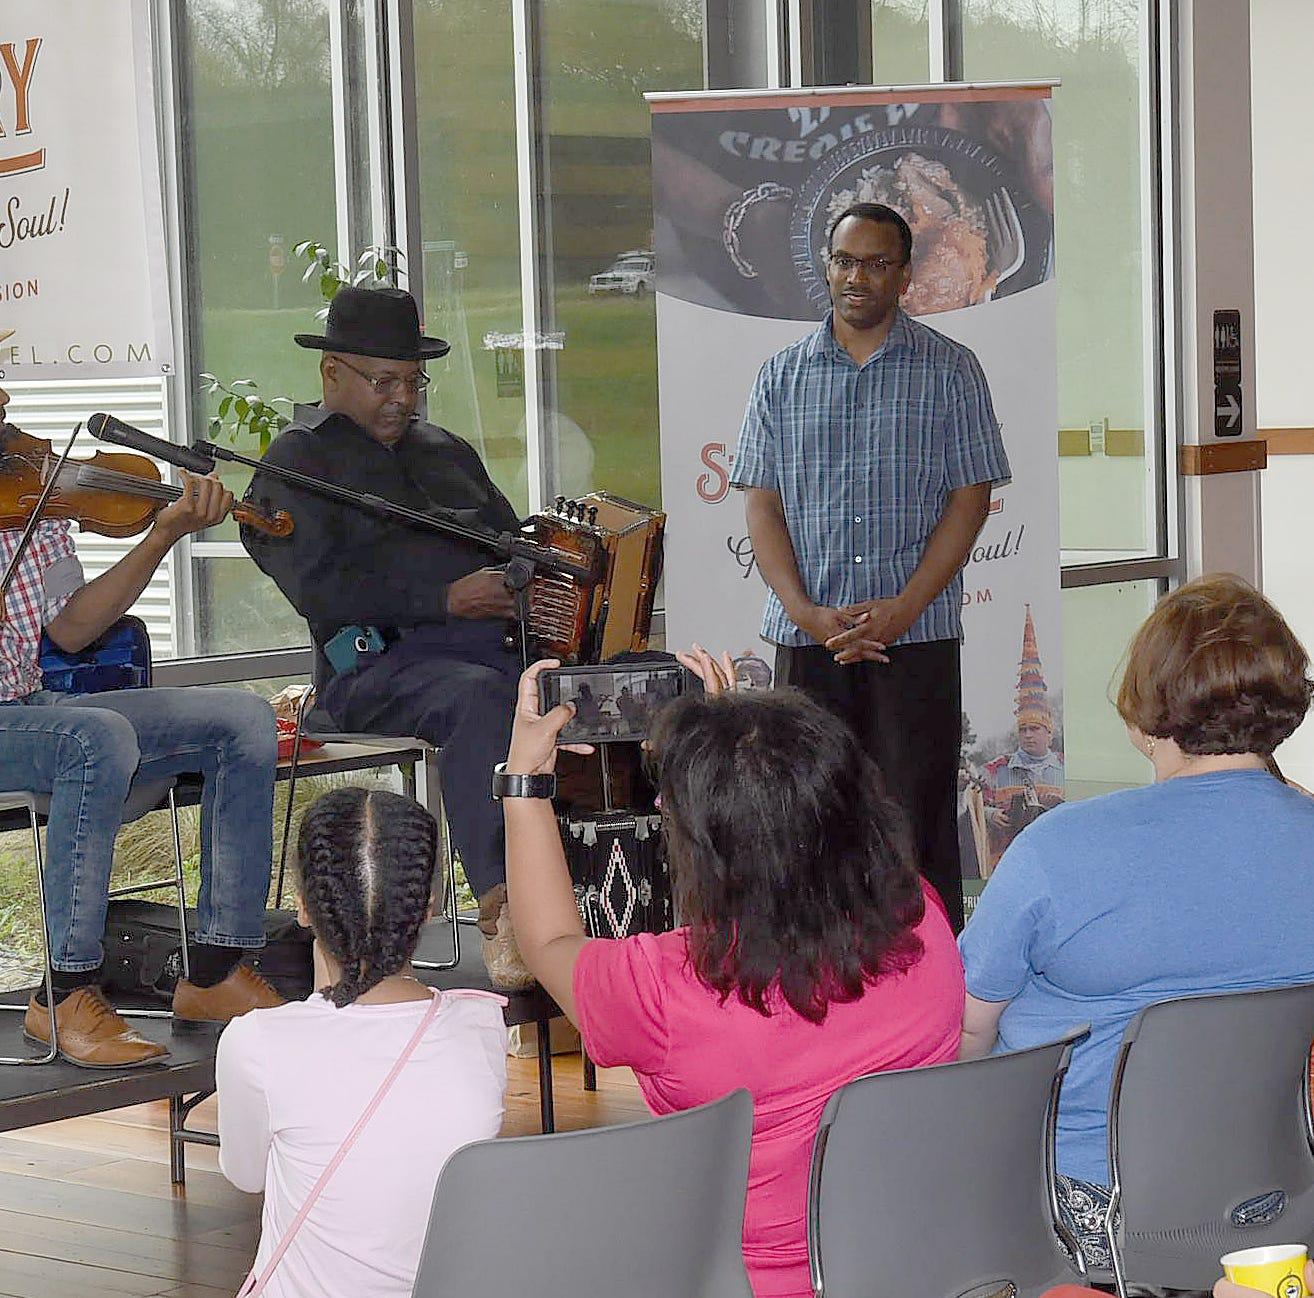 Amede Ardoin descendants pay tribute to Louisiana icon